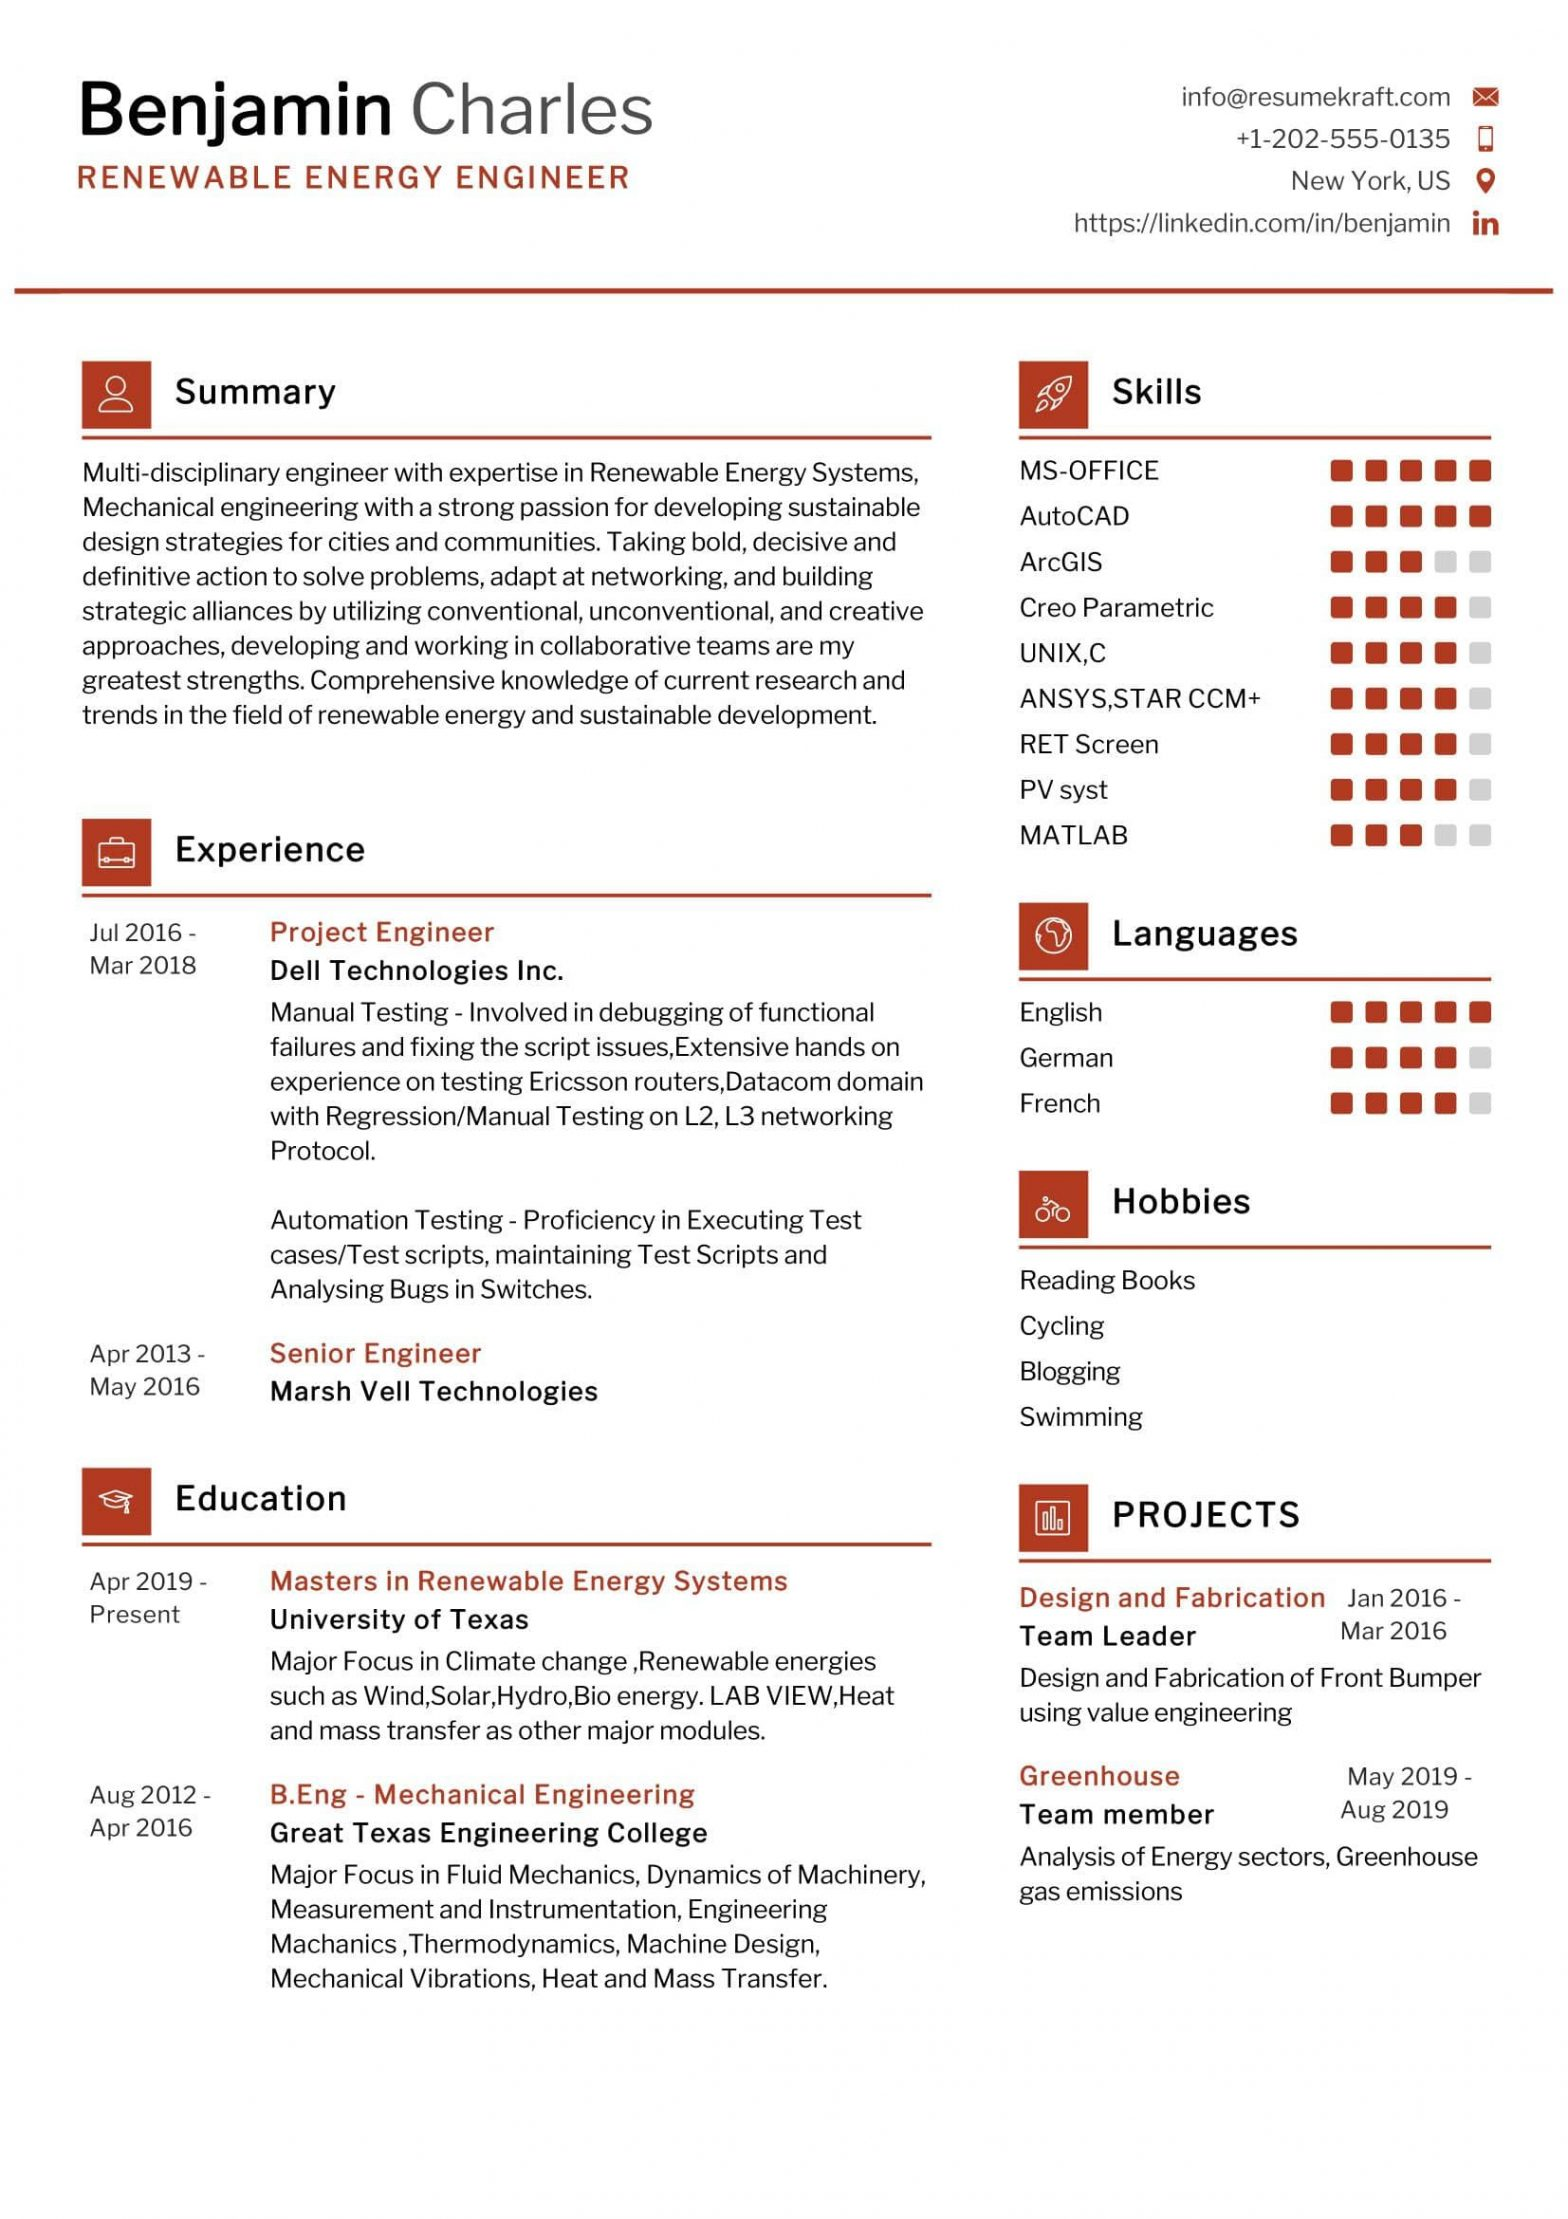 Sample Resume for solar Engineer Pdf Renewable Energy Engineer Resume Sample 2021 Writing Tips ...